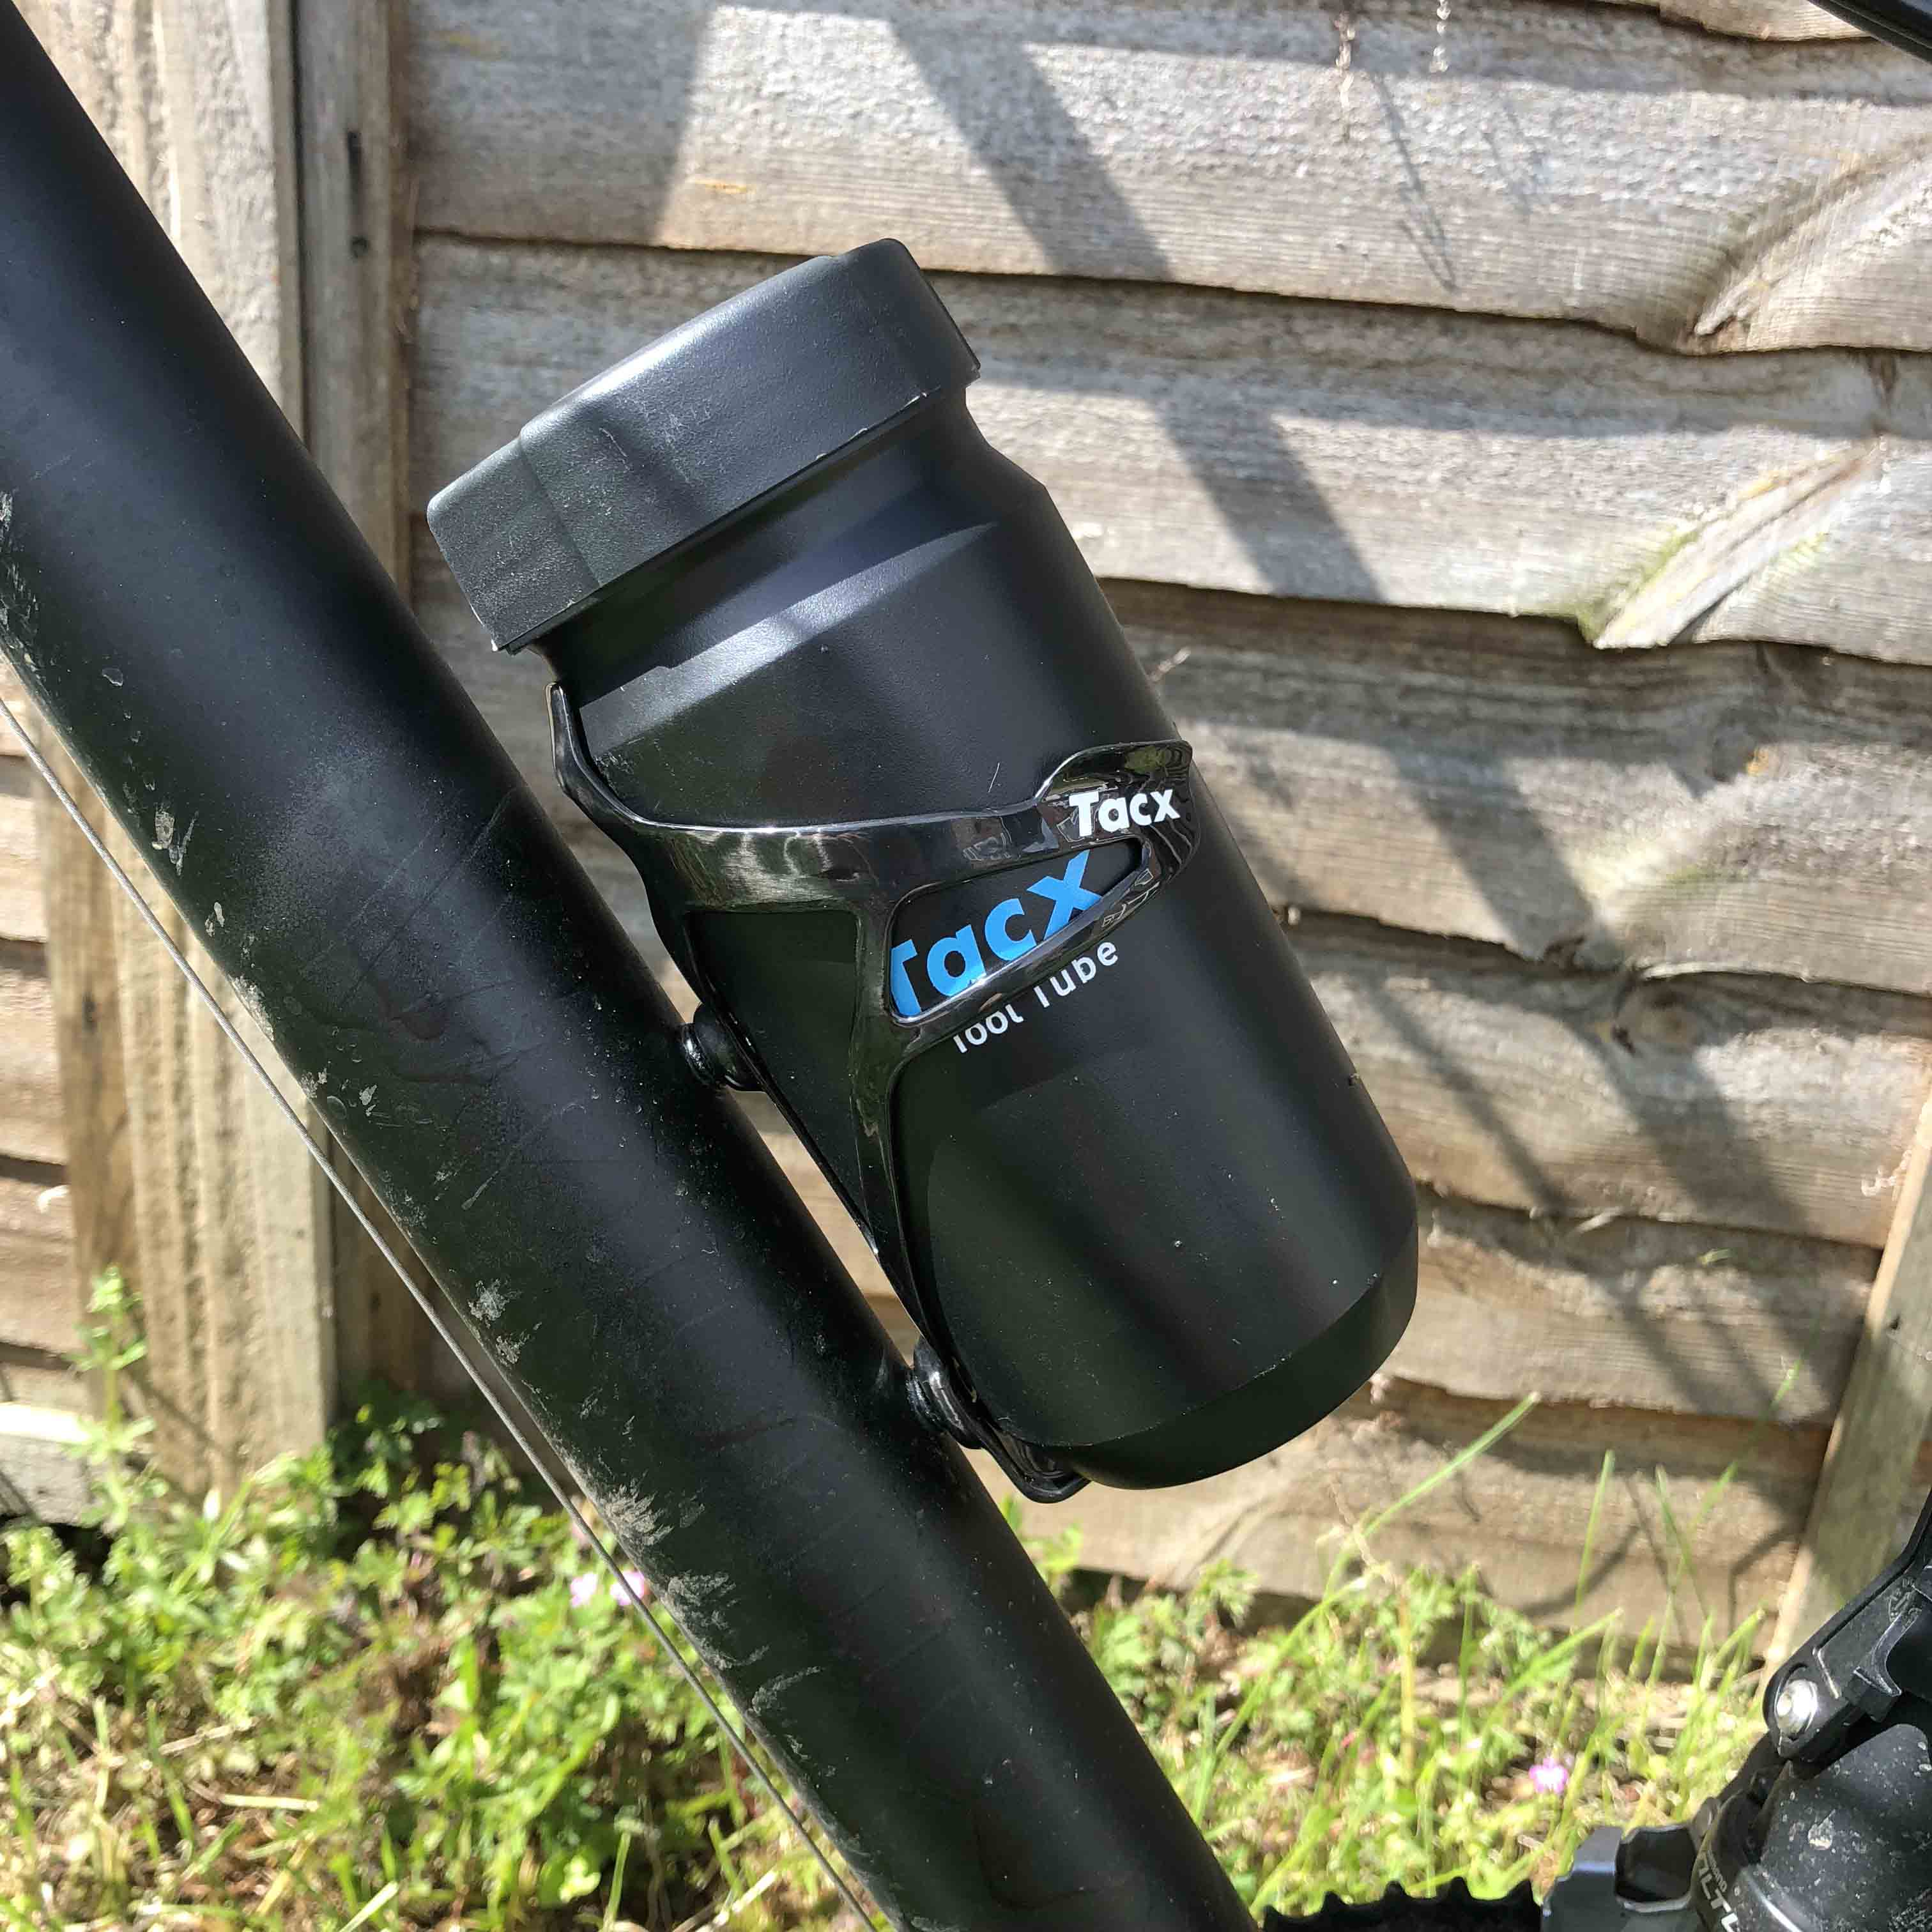 Tacx Tool Tube Plus Product Review Totalmtb